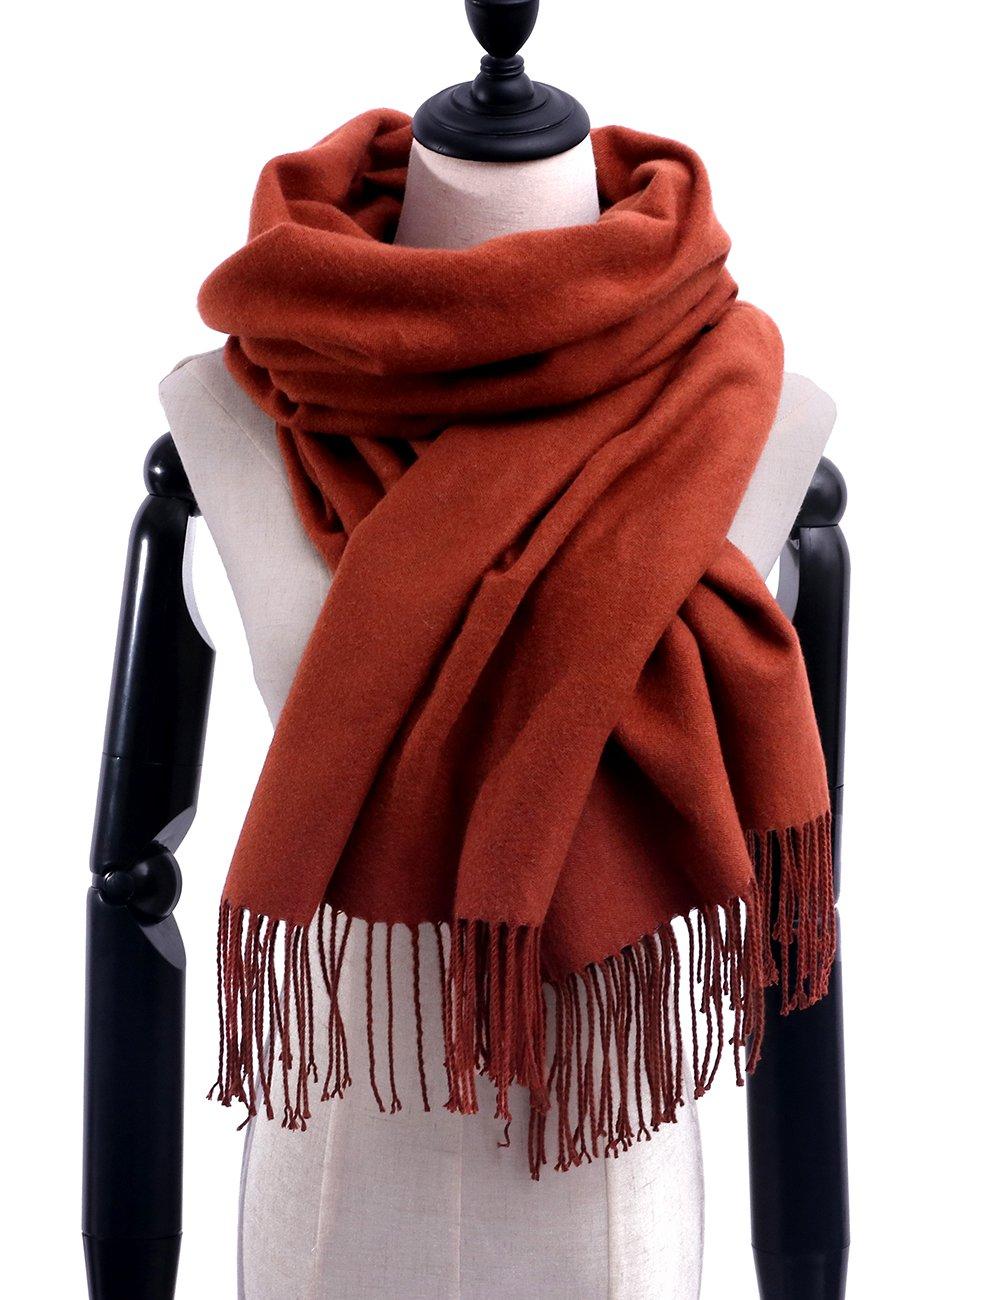 Women Soft Pashmina Scarf Stylish Warm Blanket Scarves Solid Winter Shawl